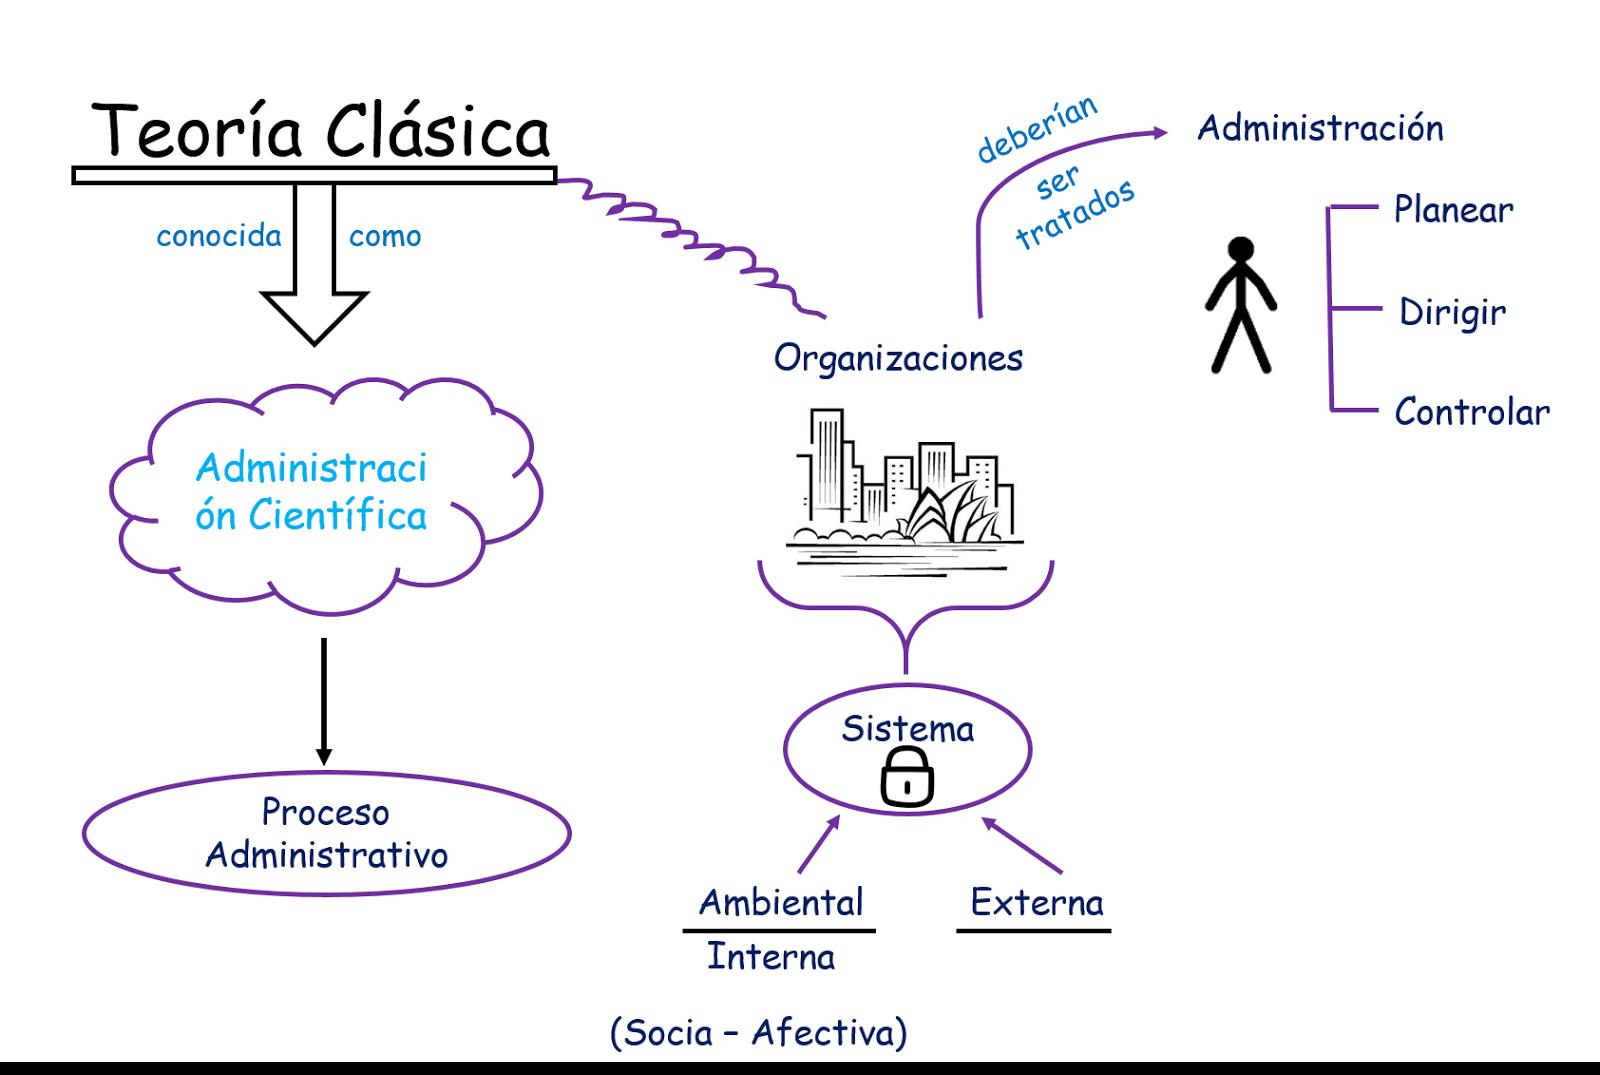 Administraci n para inform tica apuntes mapa mental for Clasica y moderna entradas